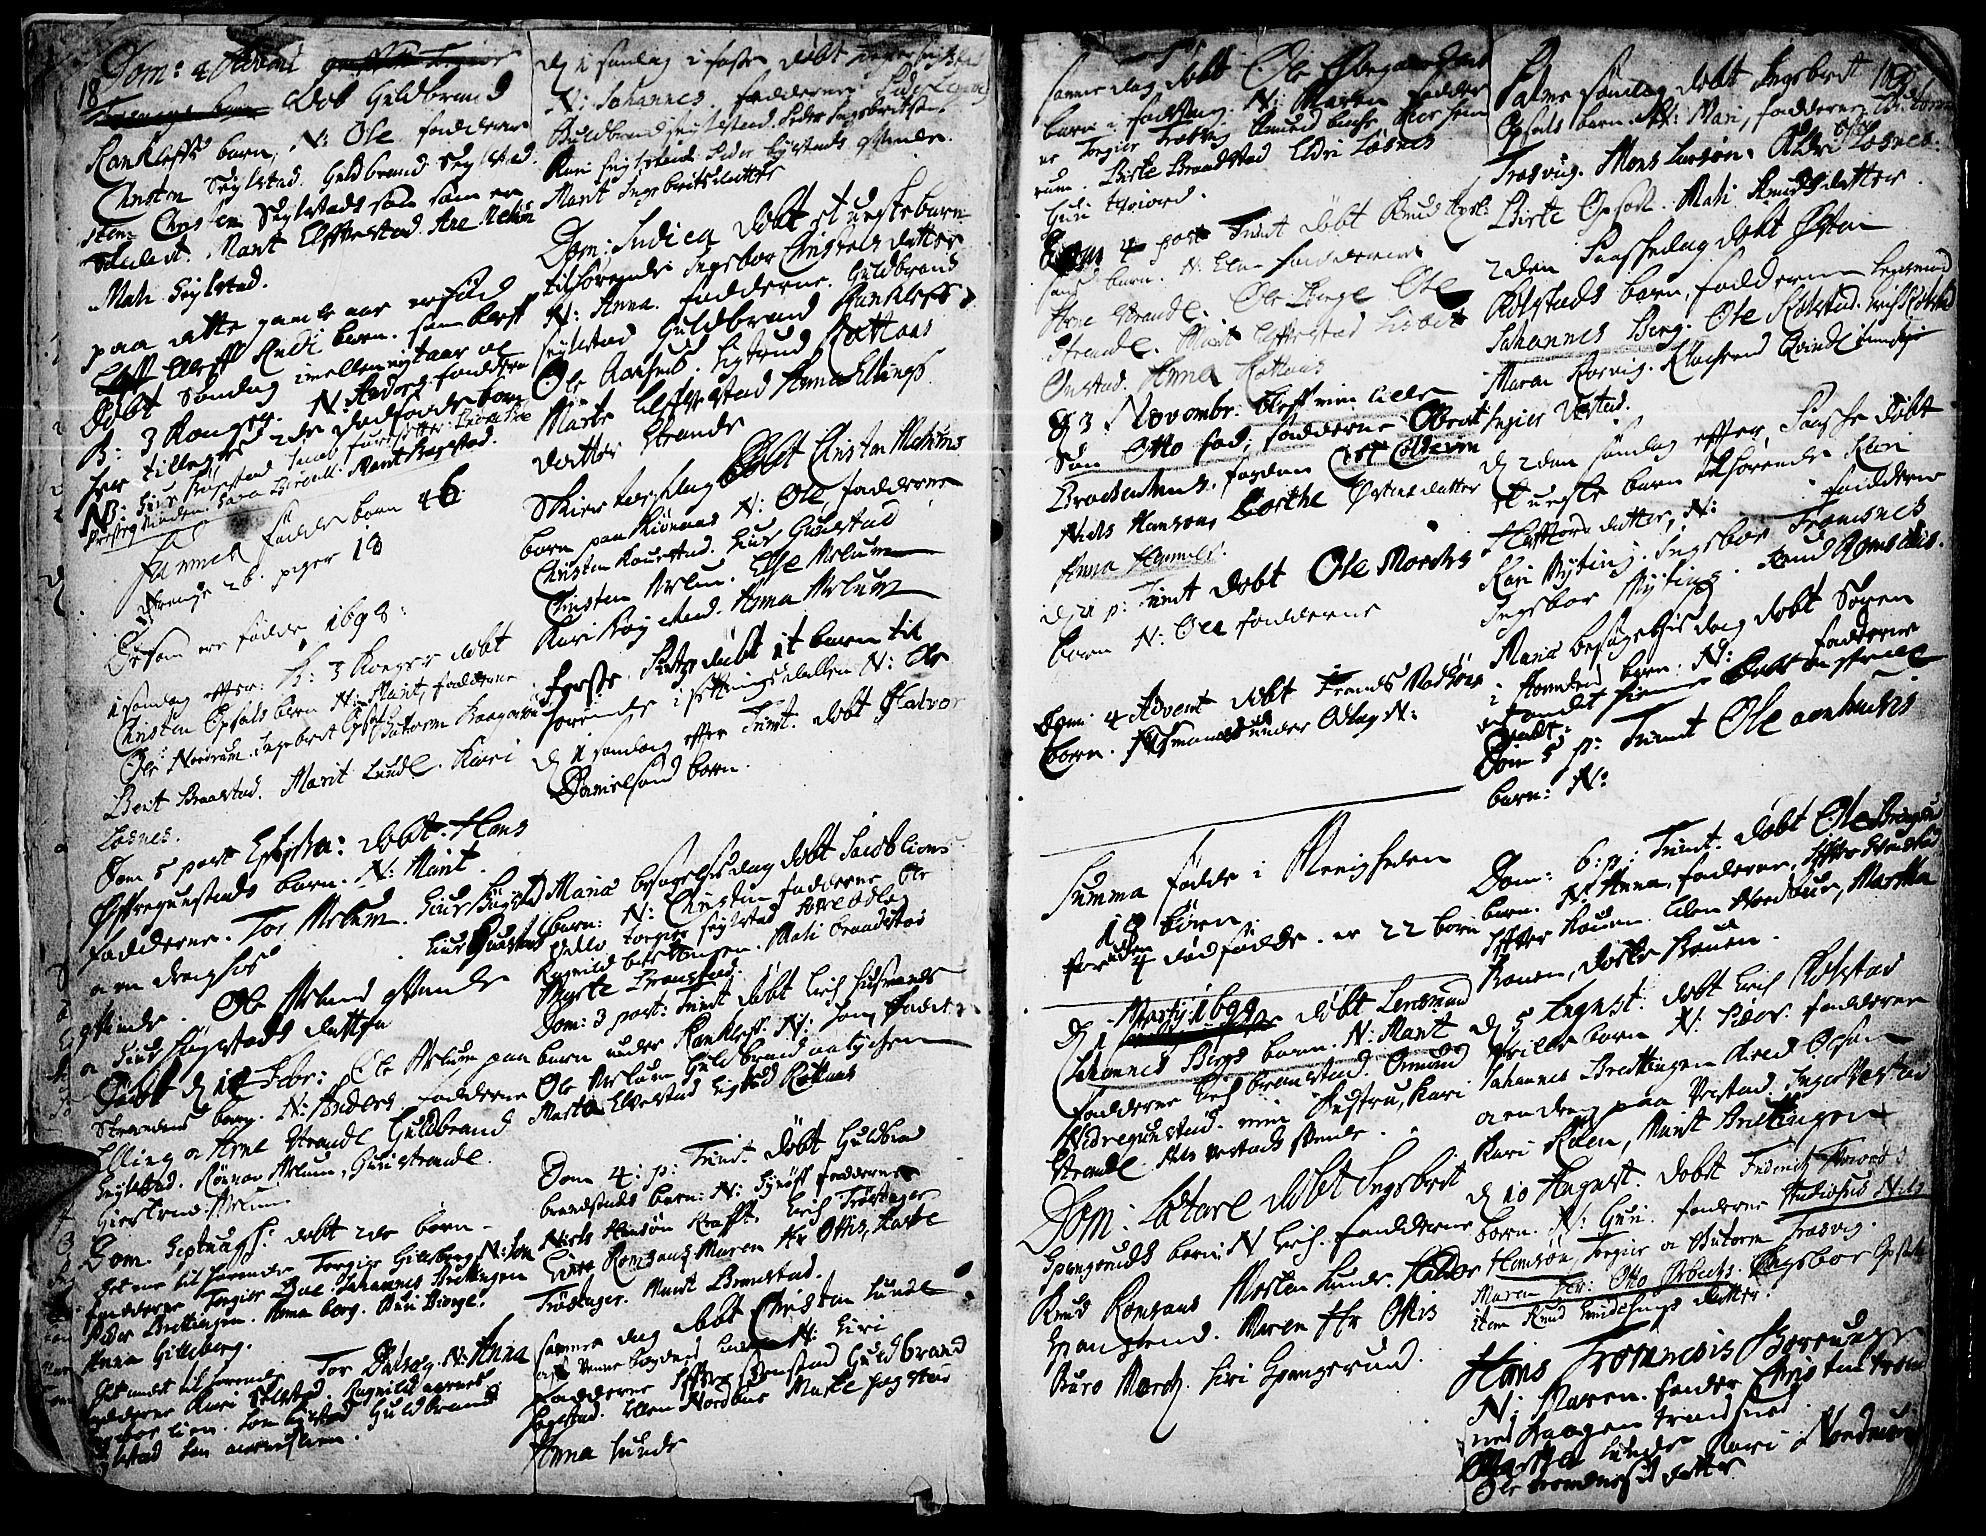 SAH, Ringebu prestekontor, Ministerialbok nr. 1, 1696-1733, s. 18-19